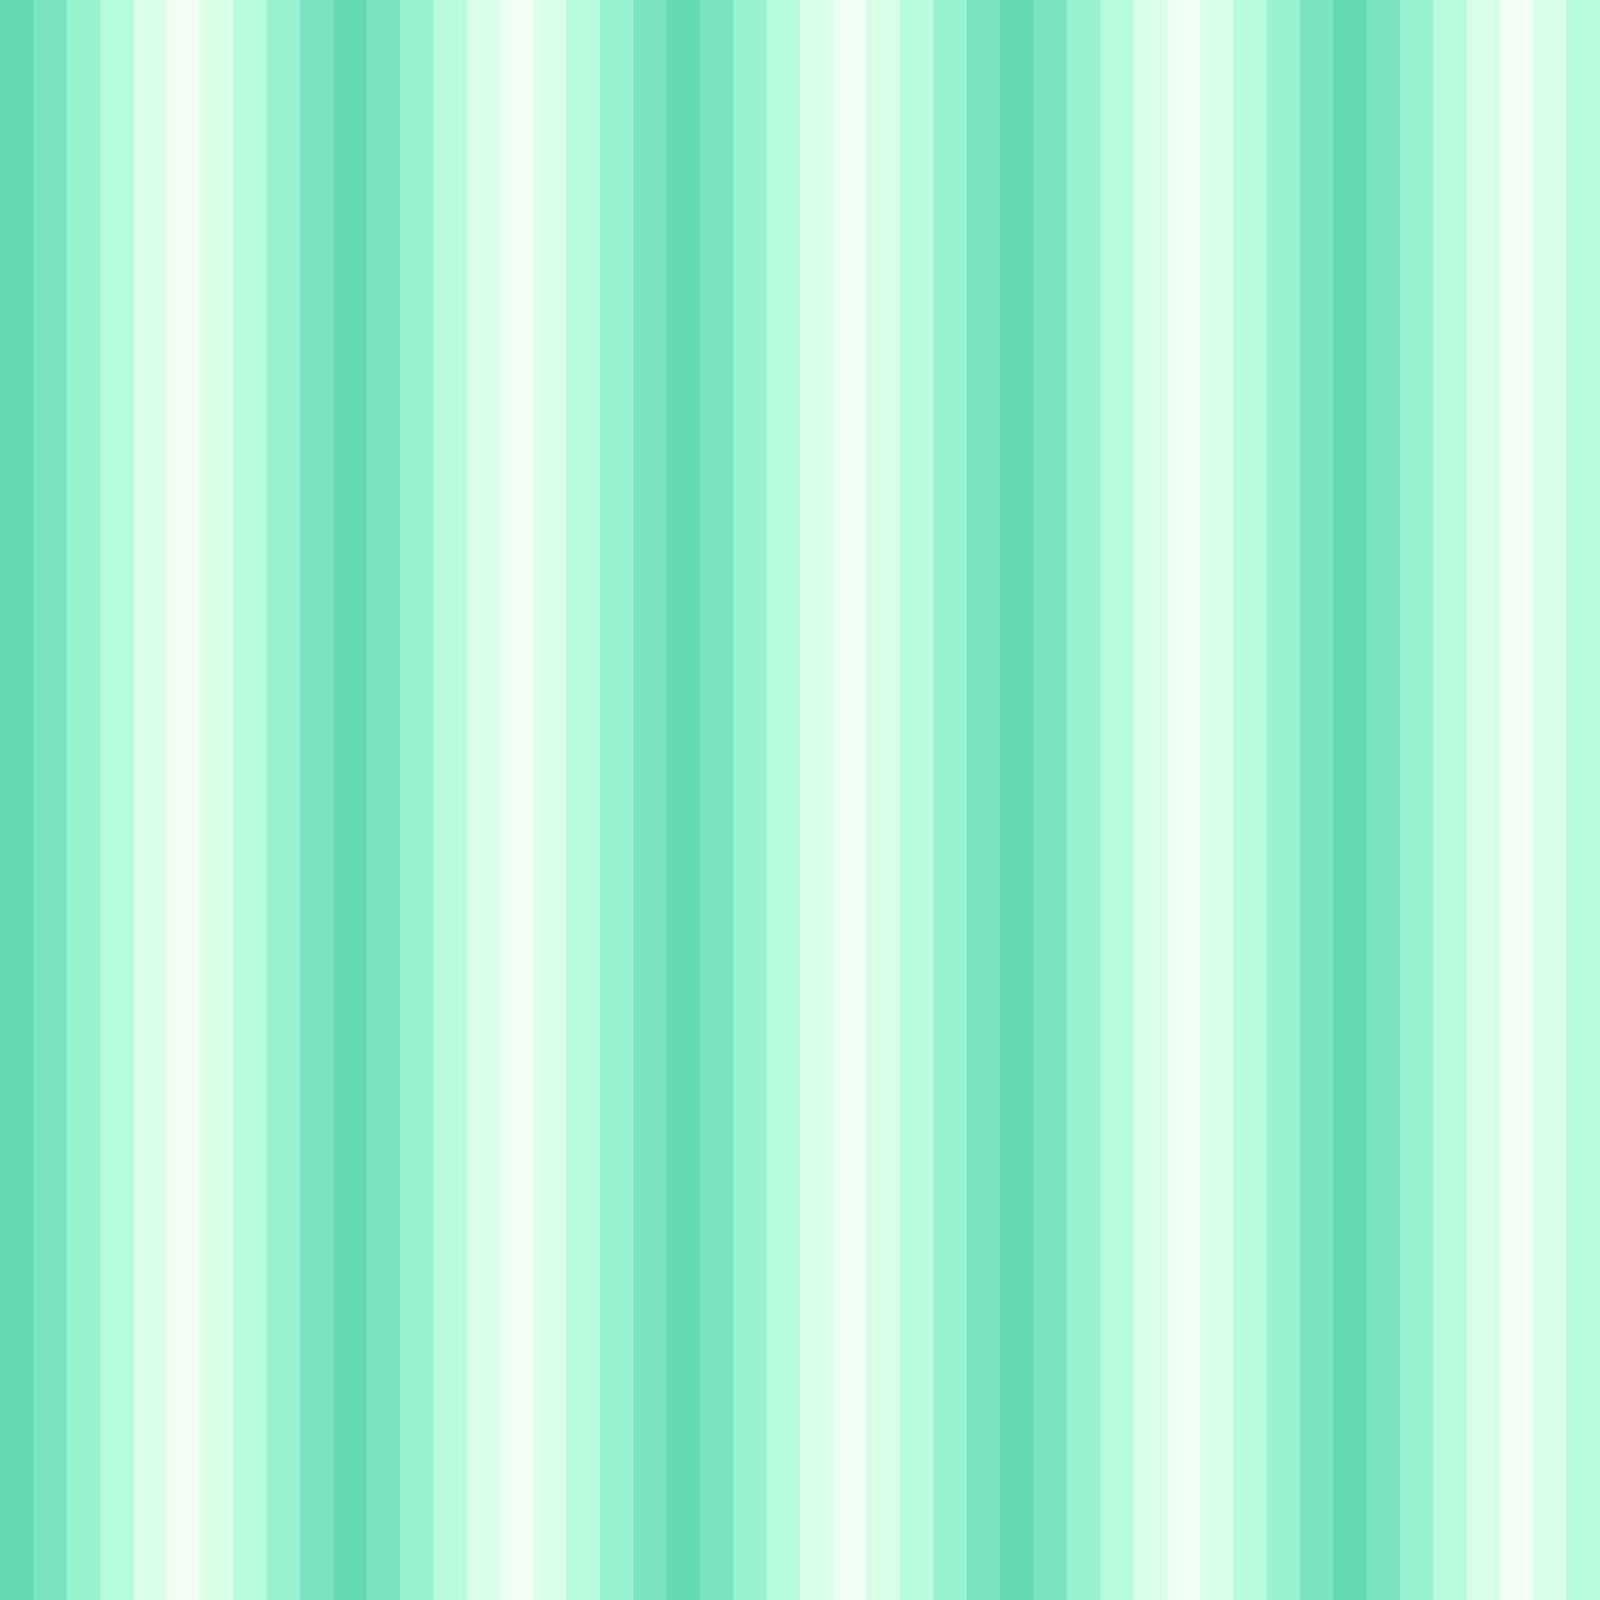 Butterscotch Stripes in Mint